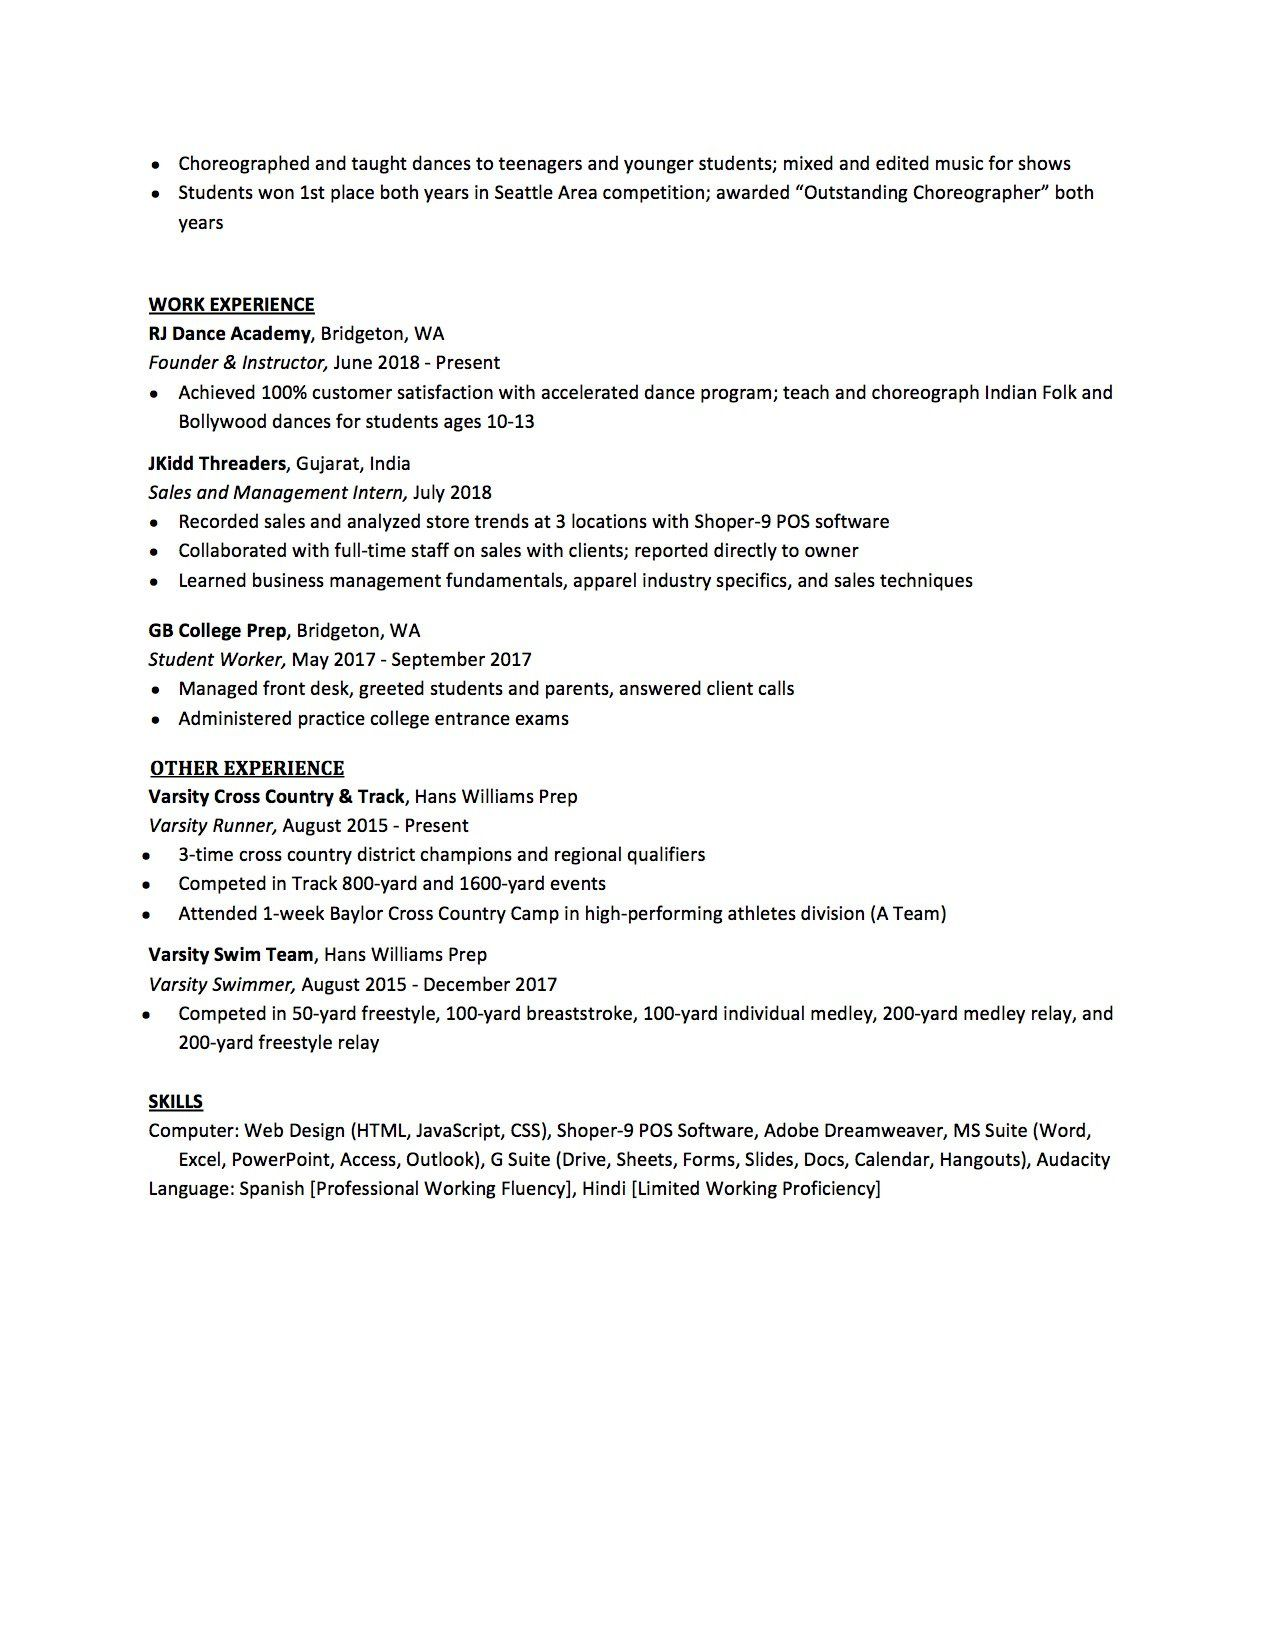 007 Sensational High School Student Resume Template Design  Free Microsoft Word 2010Full